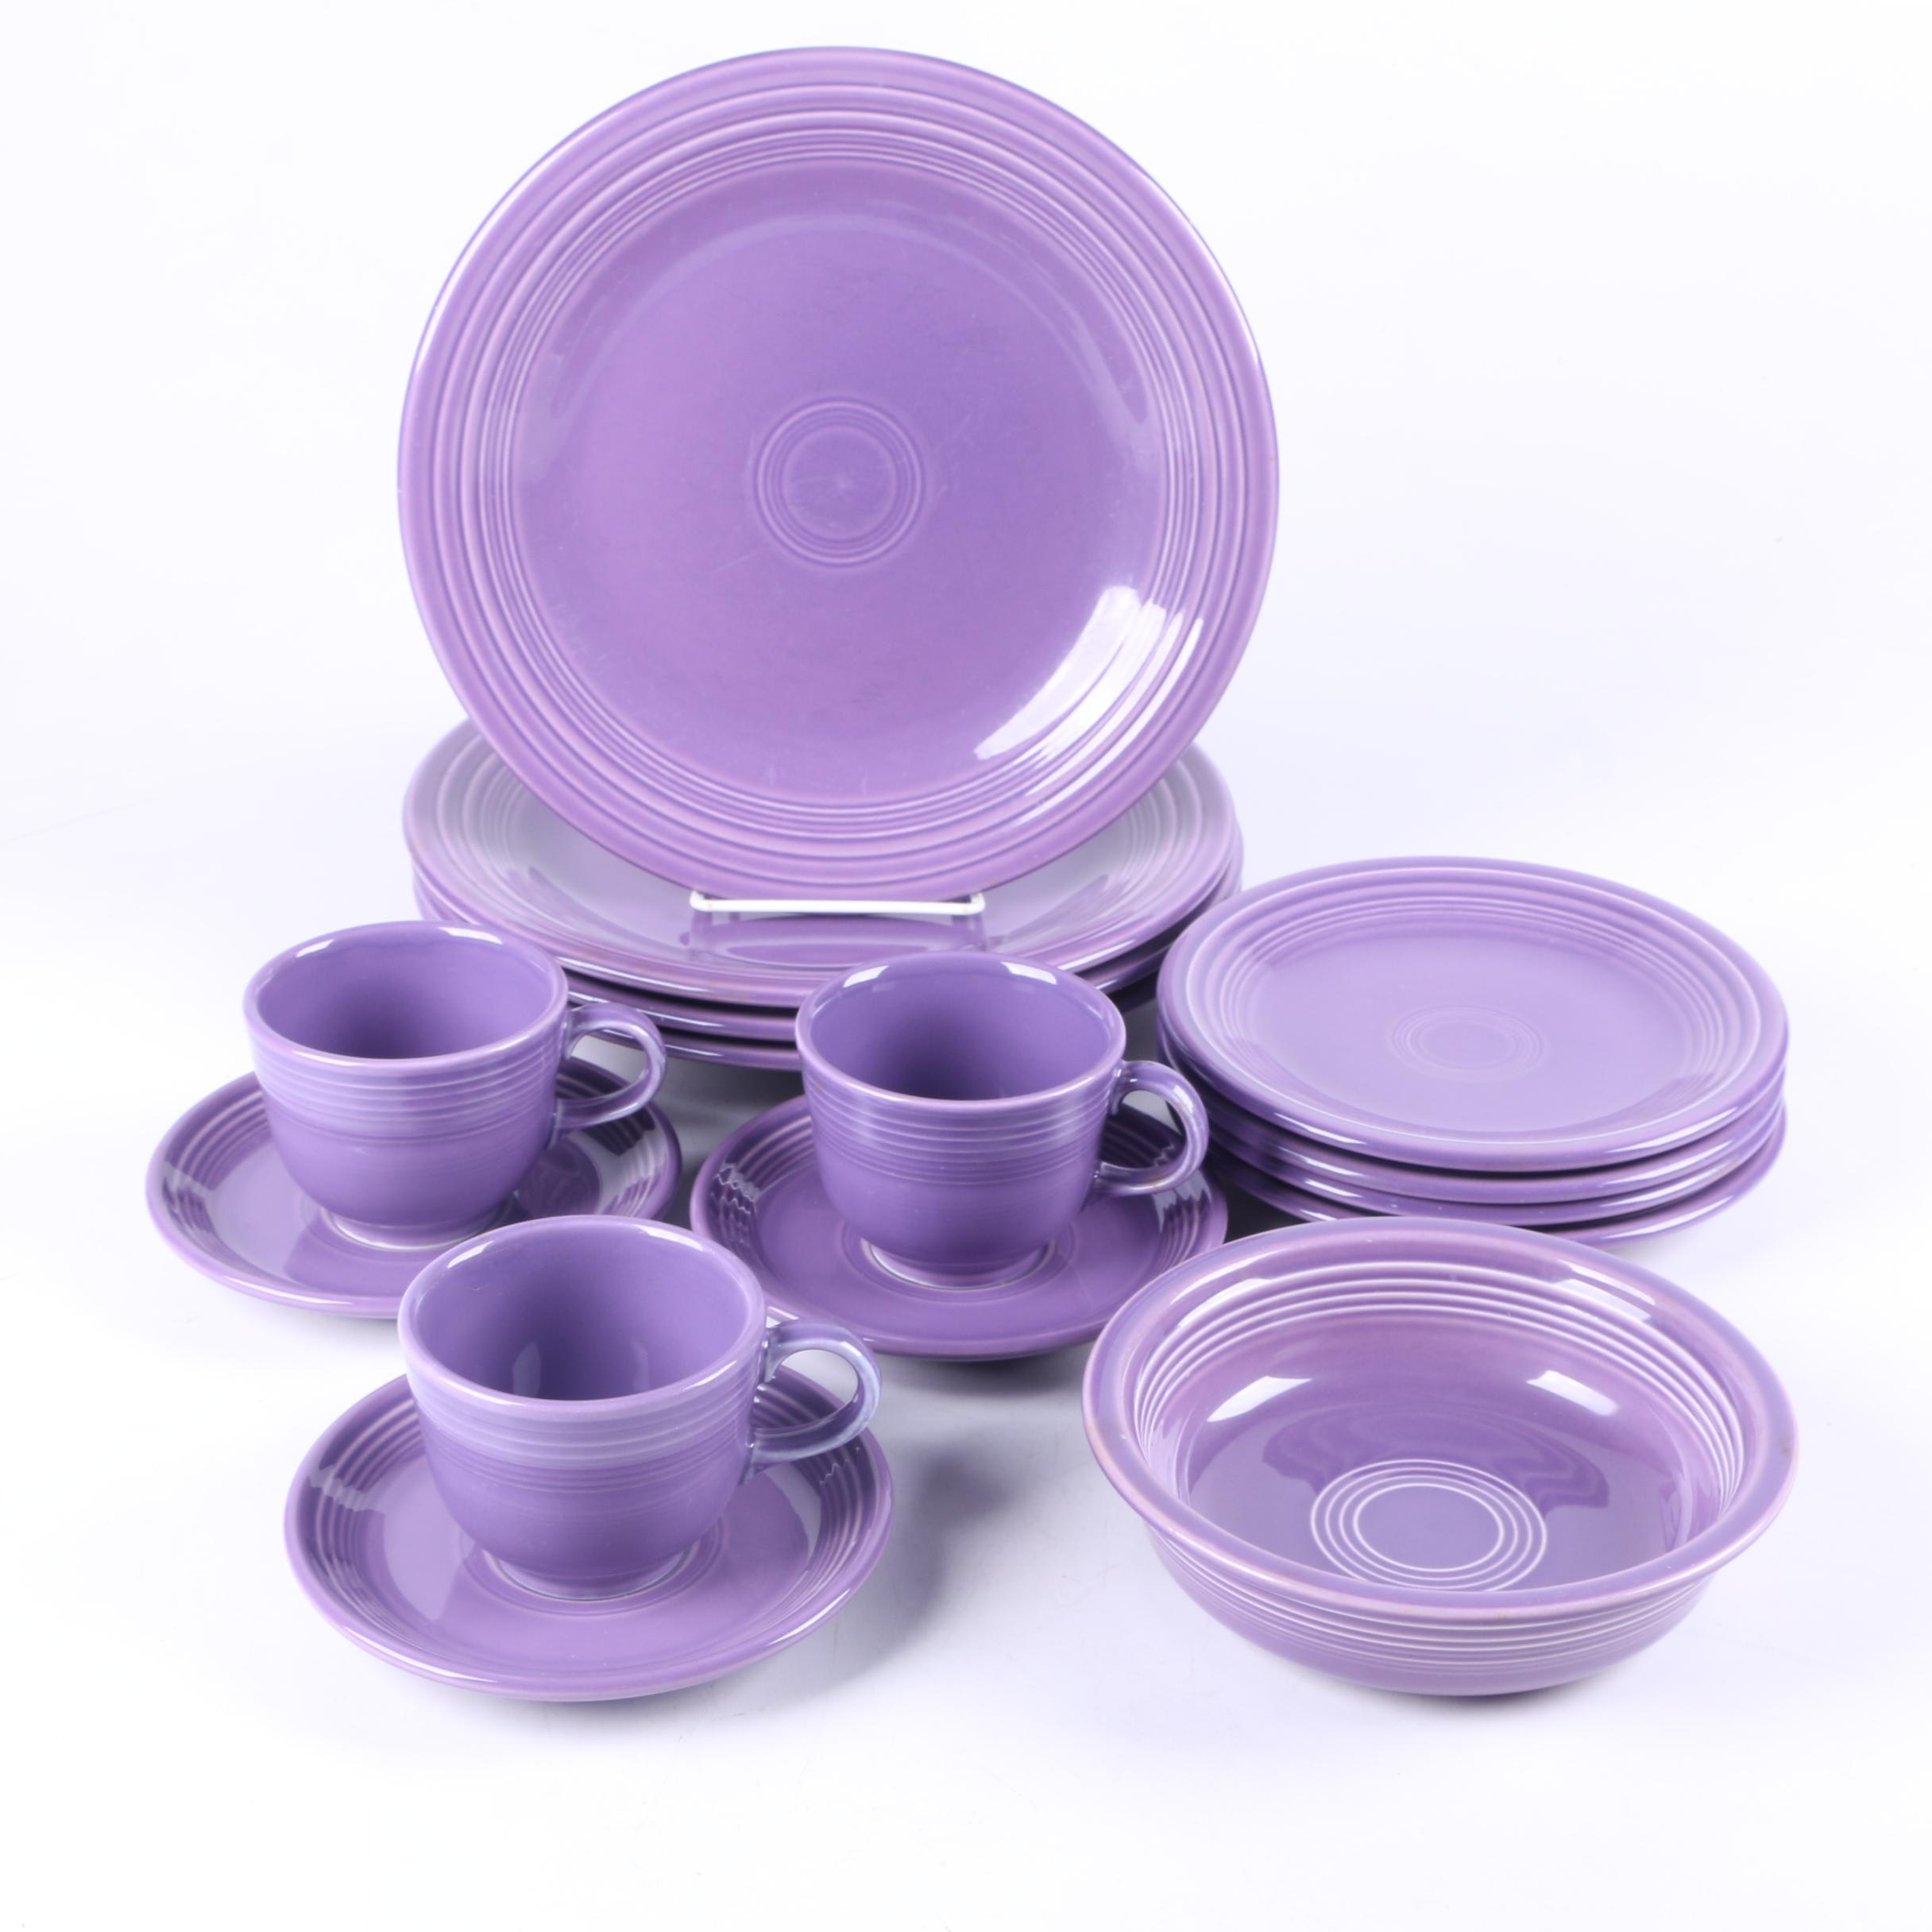 Homer Laughlin \ Fiesta Lilac\  Tableware ...  sc 1 st  EBTH.com & Homer Laughlin \